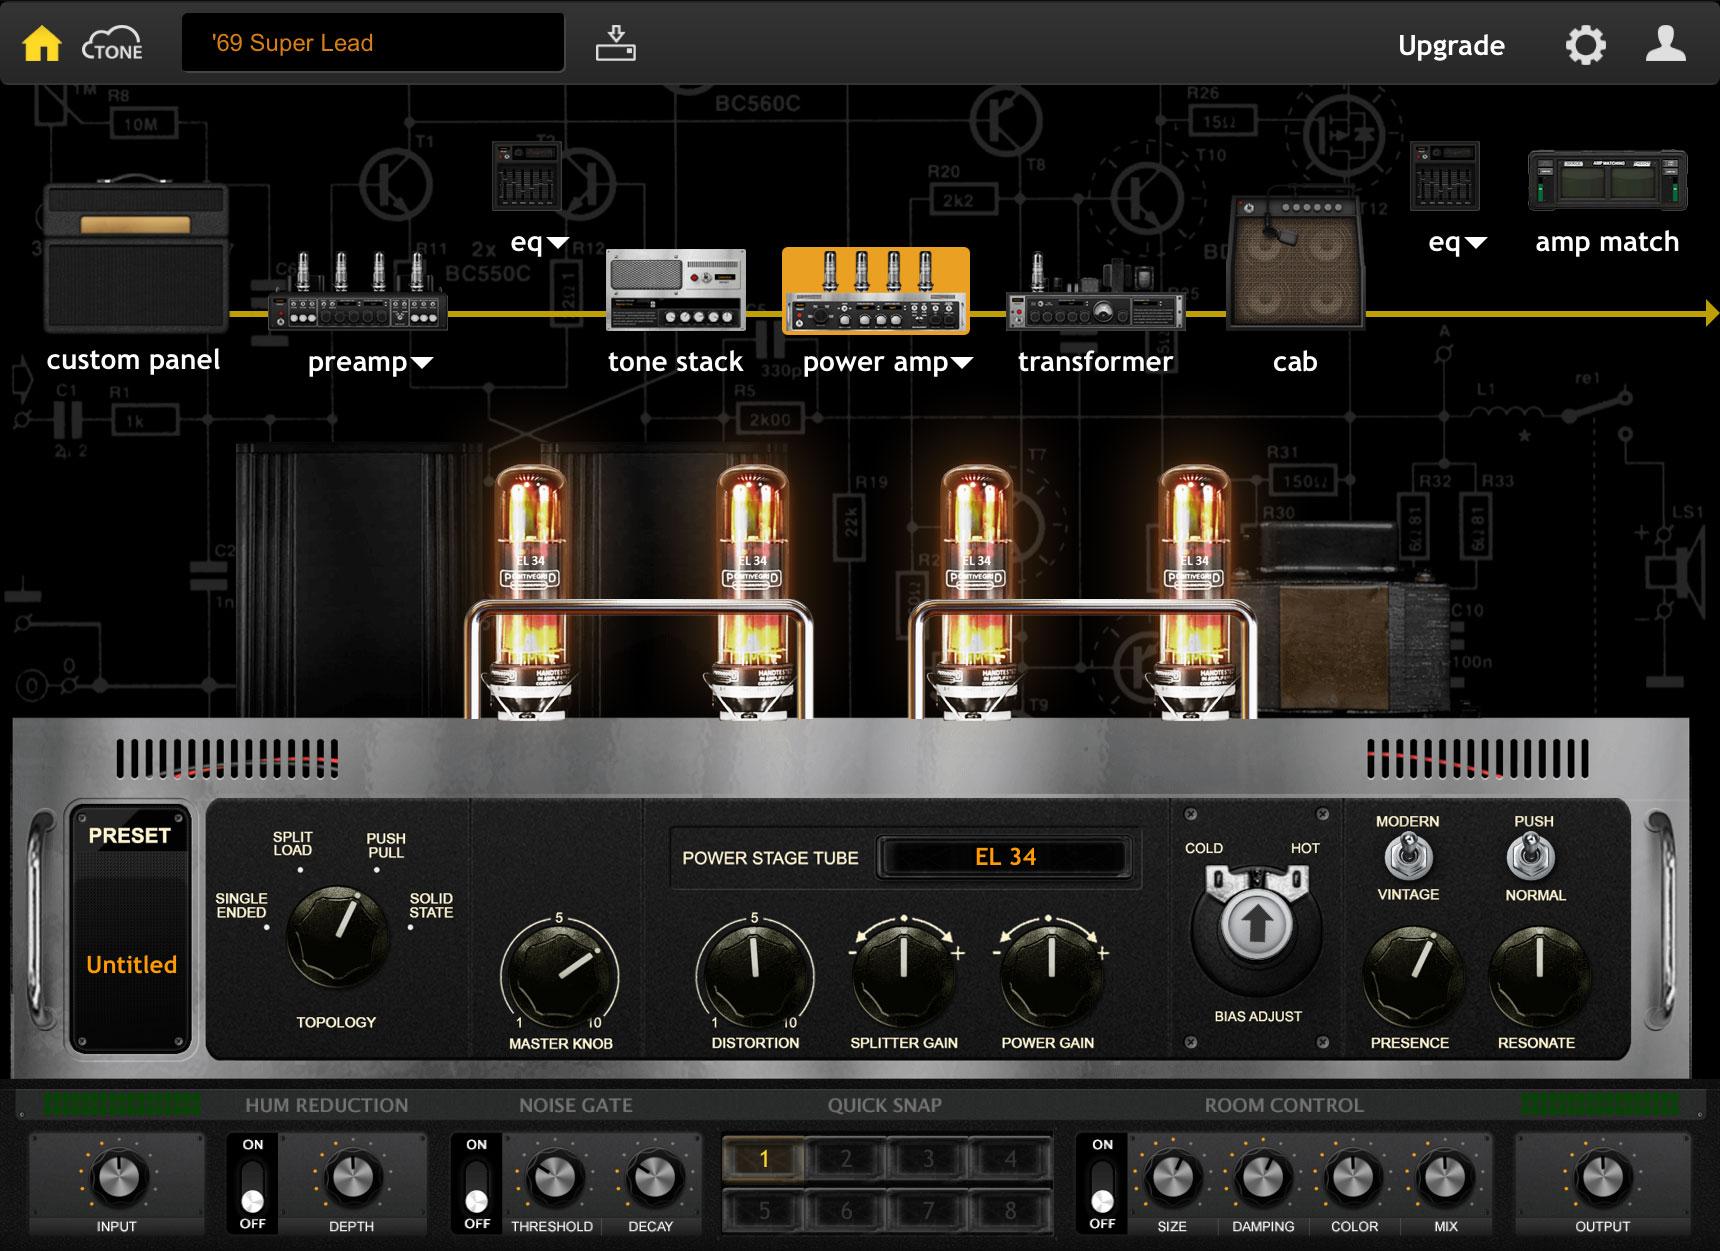 Pass Amp Camp Amp v1.6 class A amplifier Photo #2551894